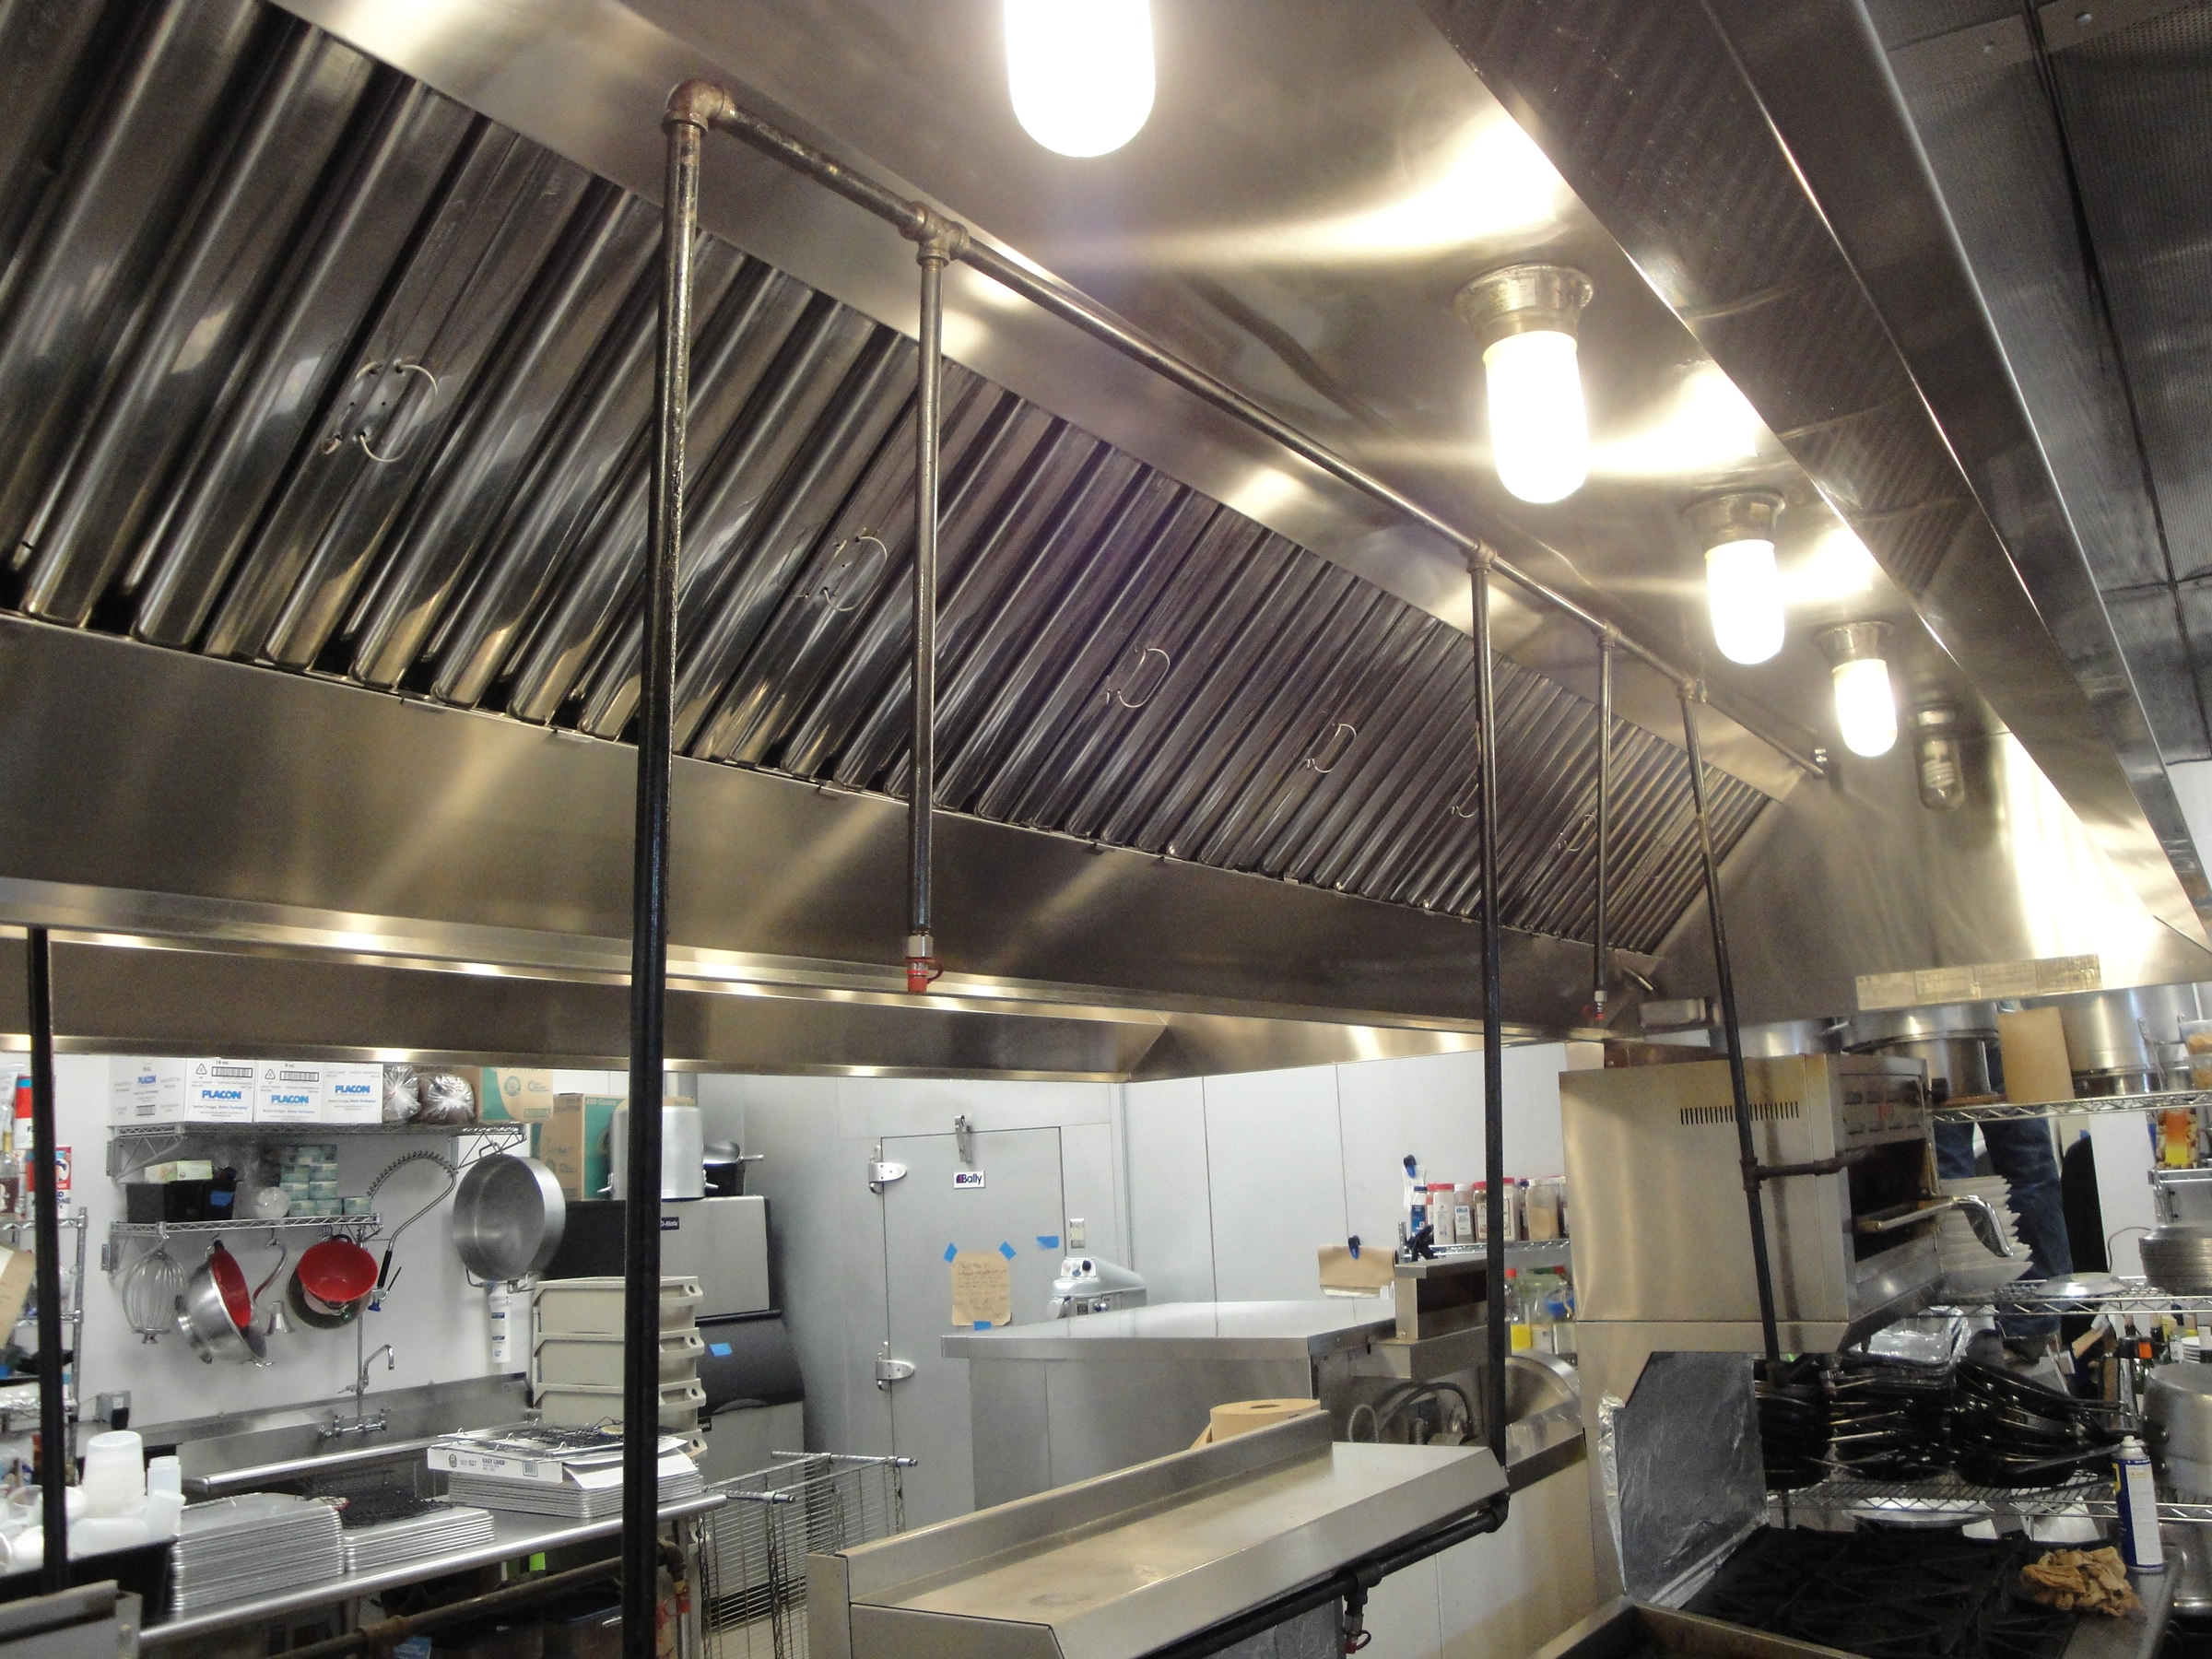 Restaurant Kitchen Vent Hood restaurant hood cleaning service | austin tx regarding restaurant